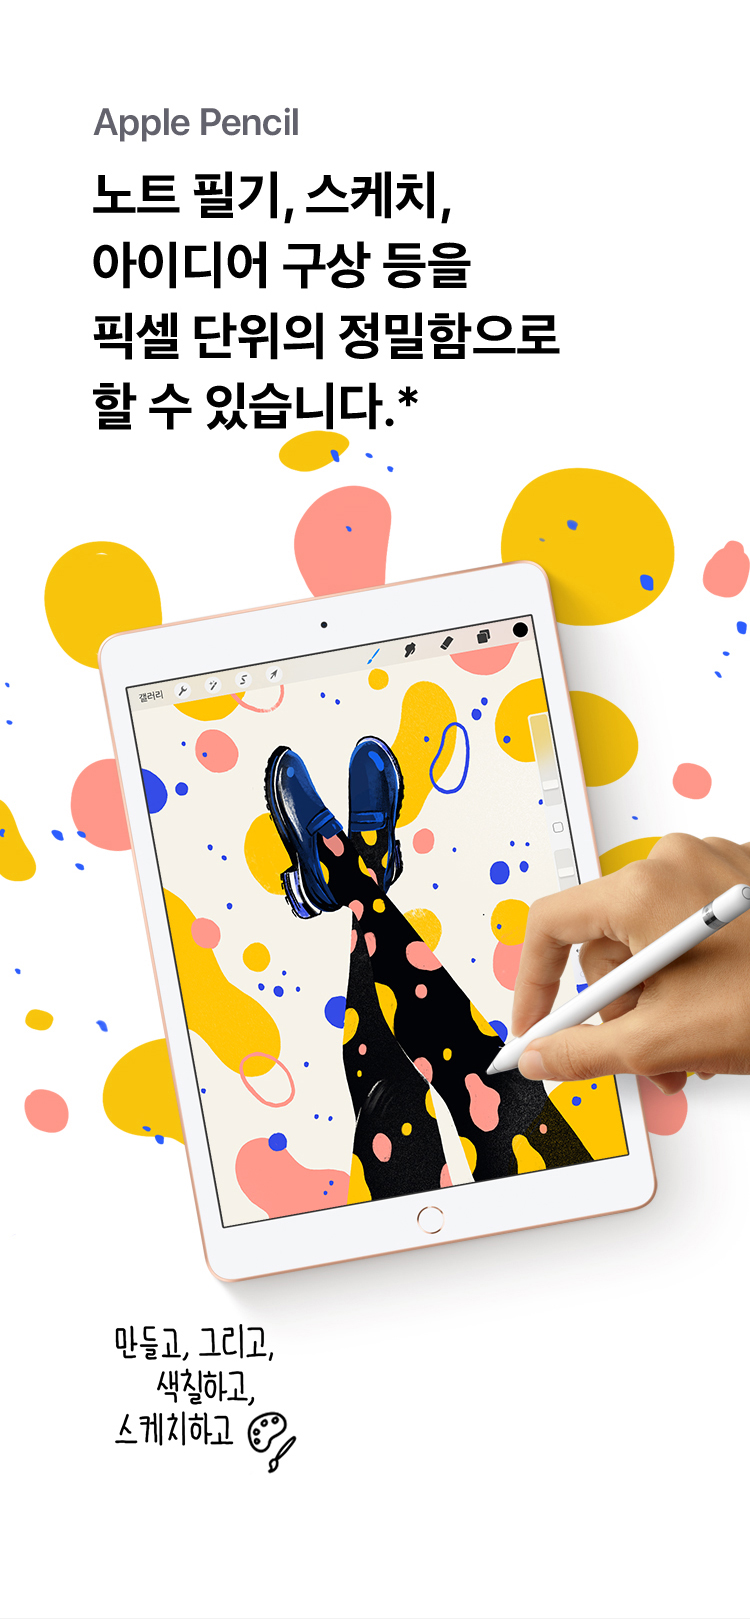 Apple Pencil / 노트필기, 스케치, 아이디어 구상 등을 픽셀단위의 정밀함으로 할 수 있습니다.